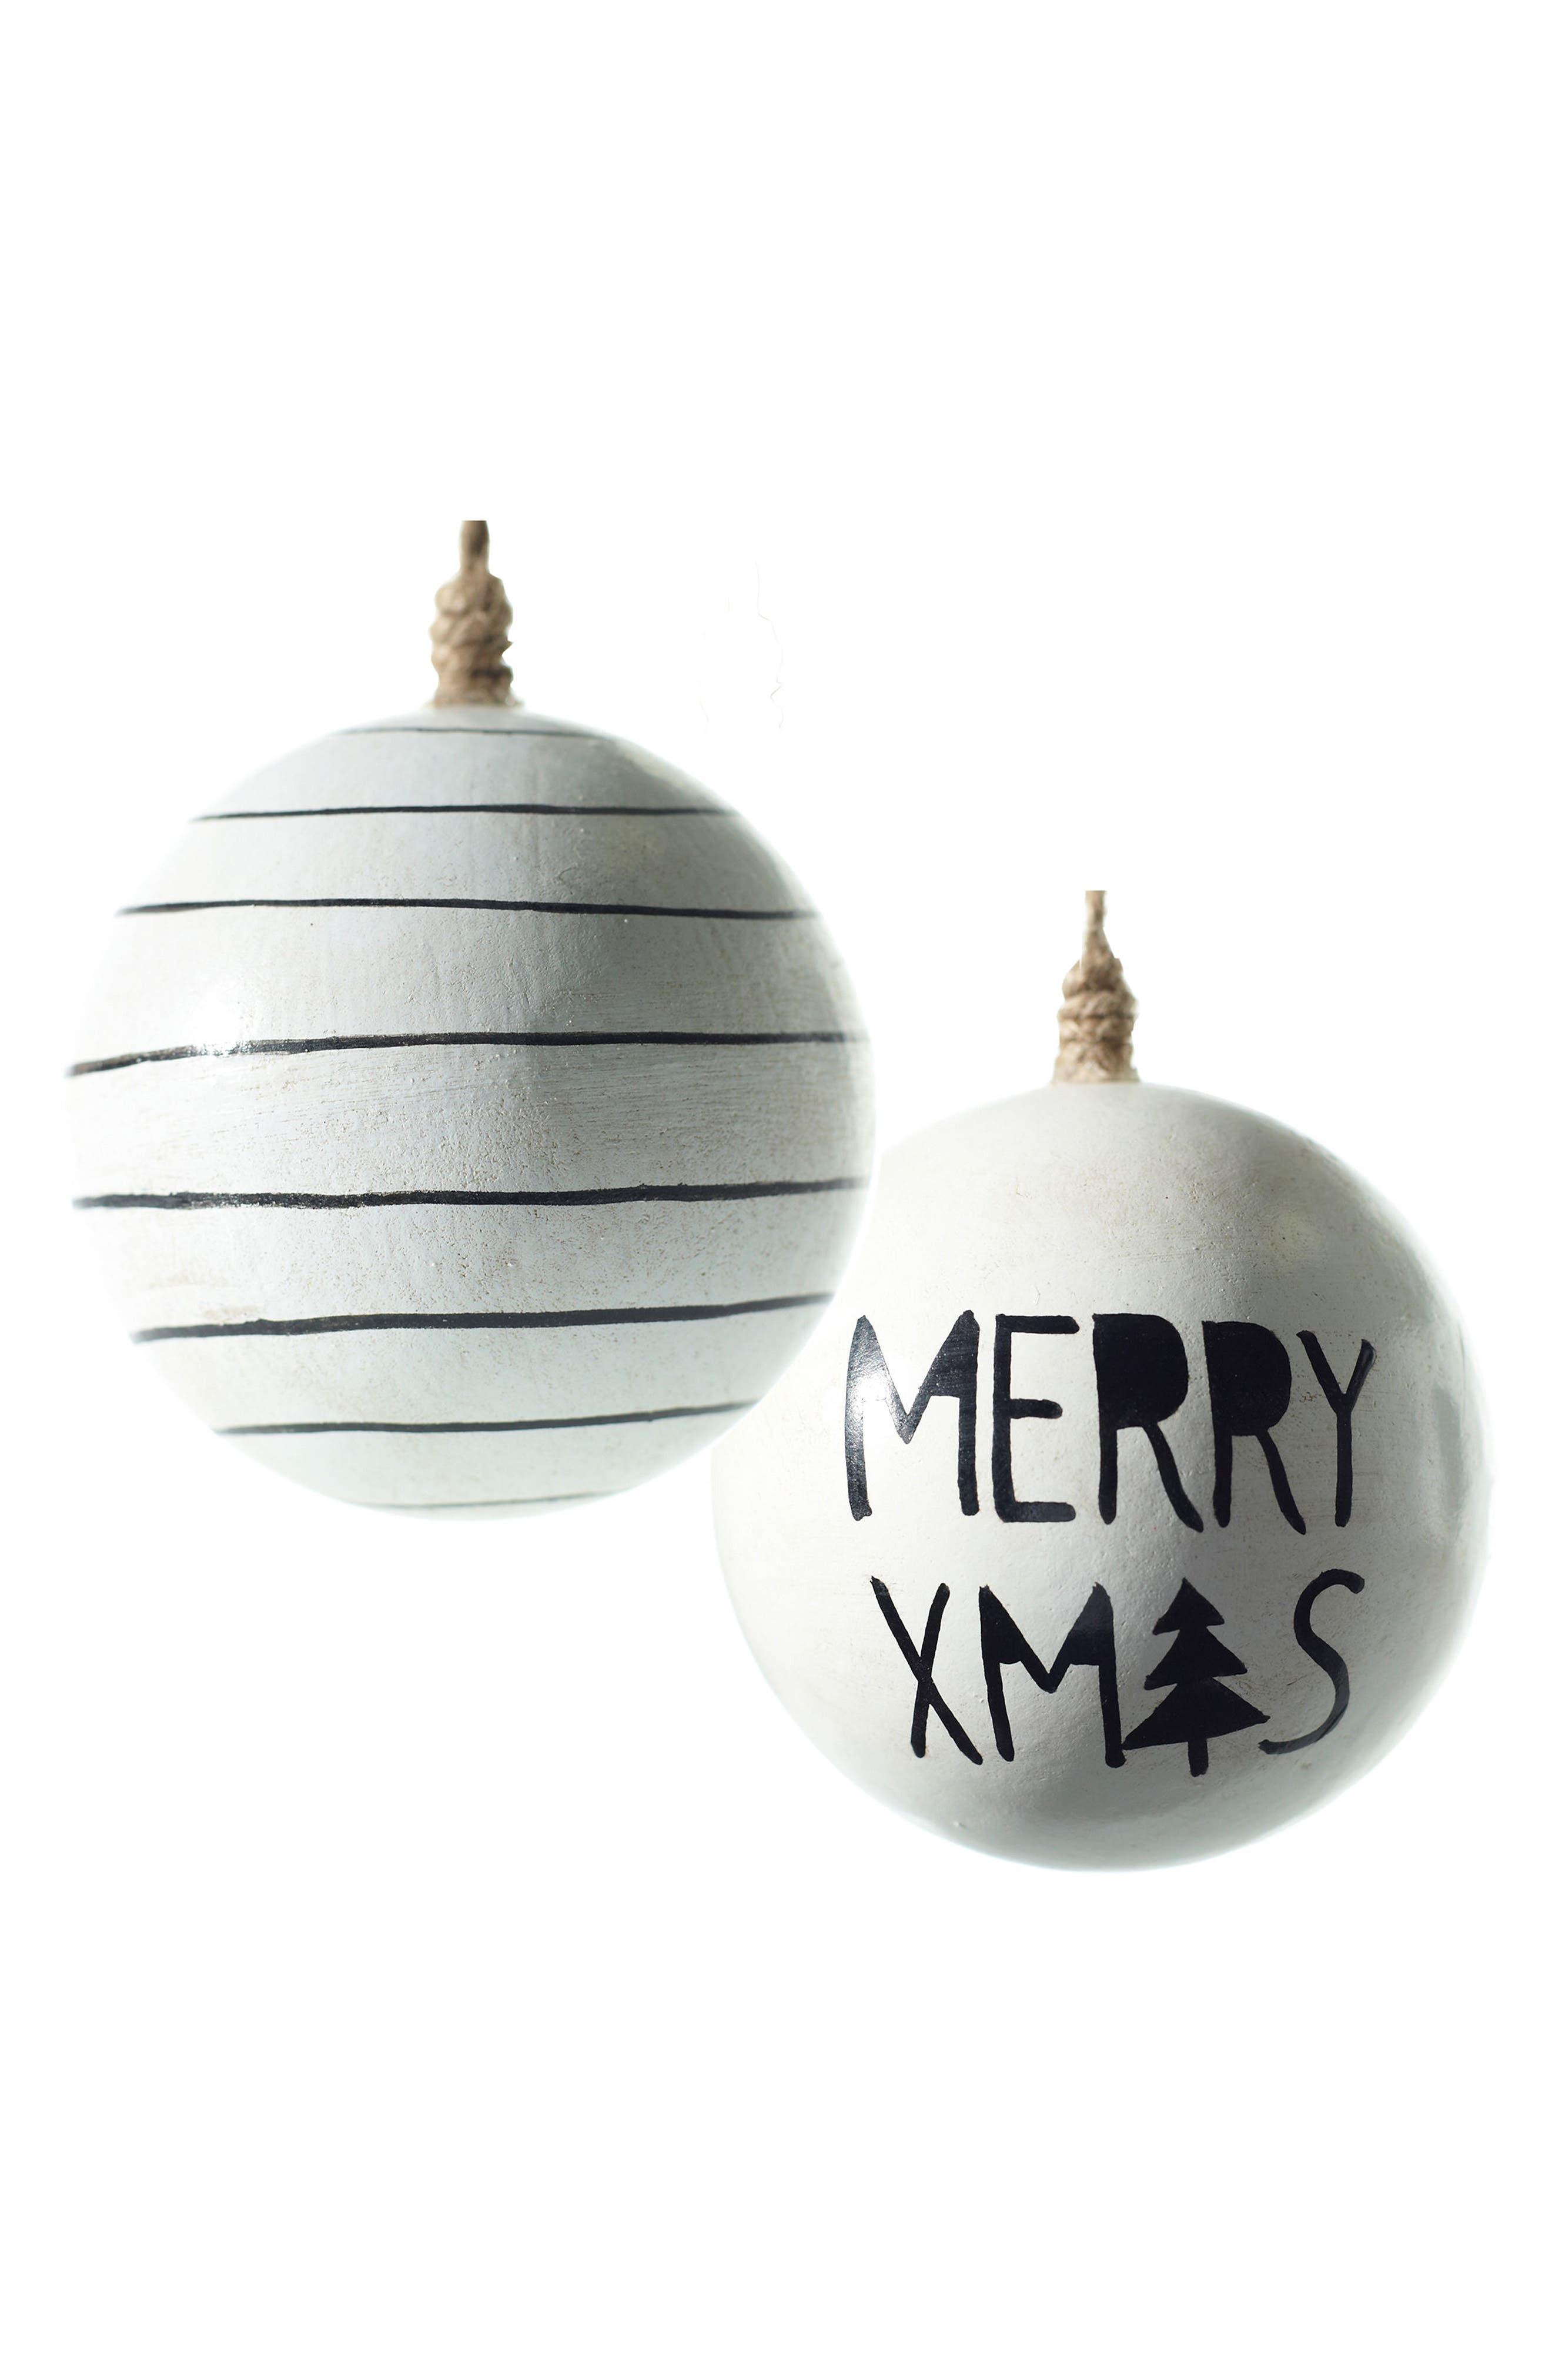 Merry Xmas Set of 2 Wooden Ball Ornaments,                             Main thumbnail 1, color,                             100